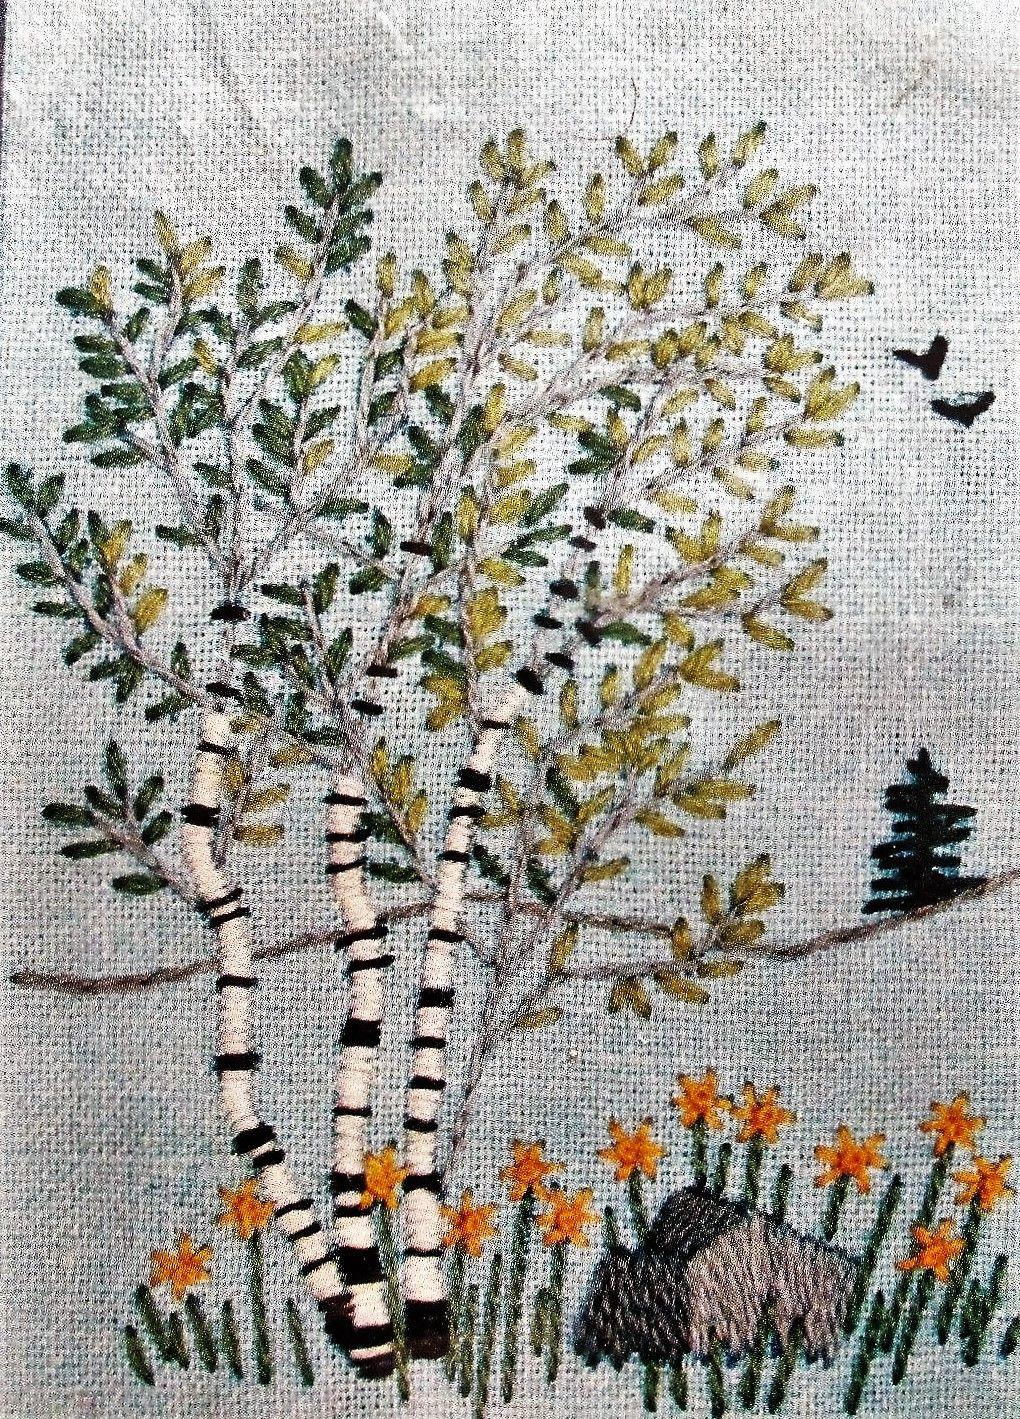 Beech trees stitching pinterest beech tree embroidery and stitch